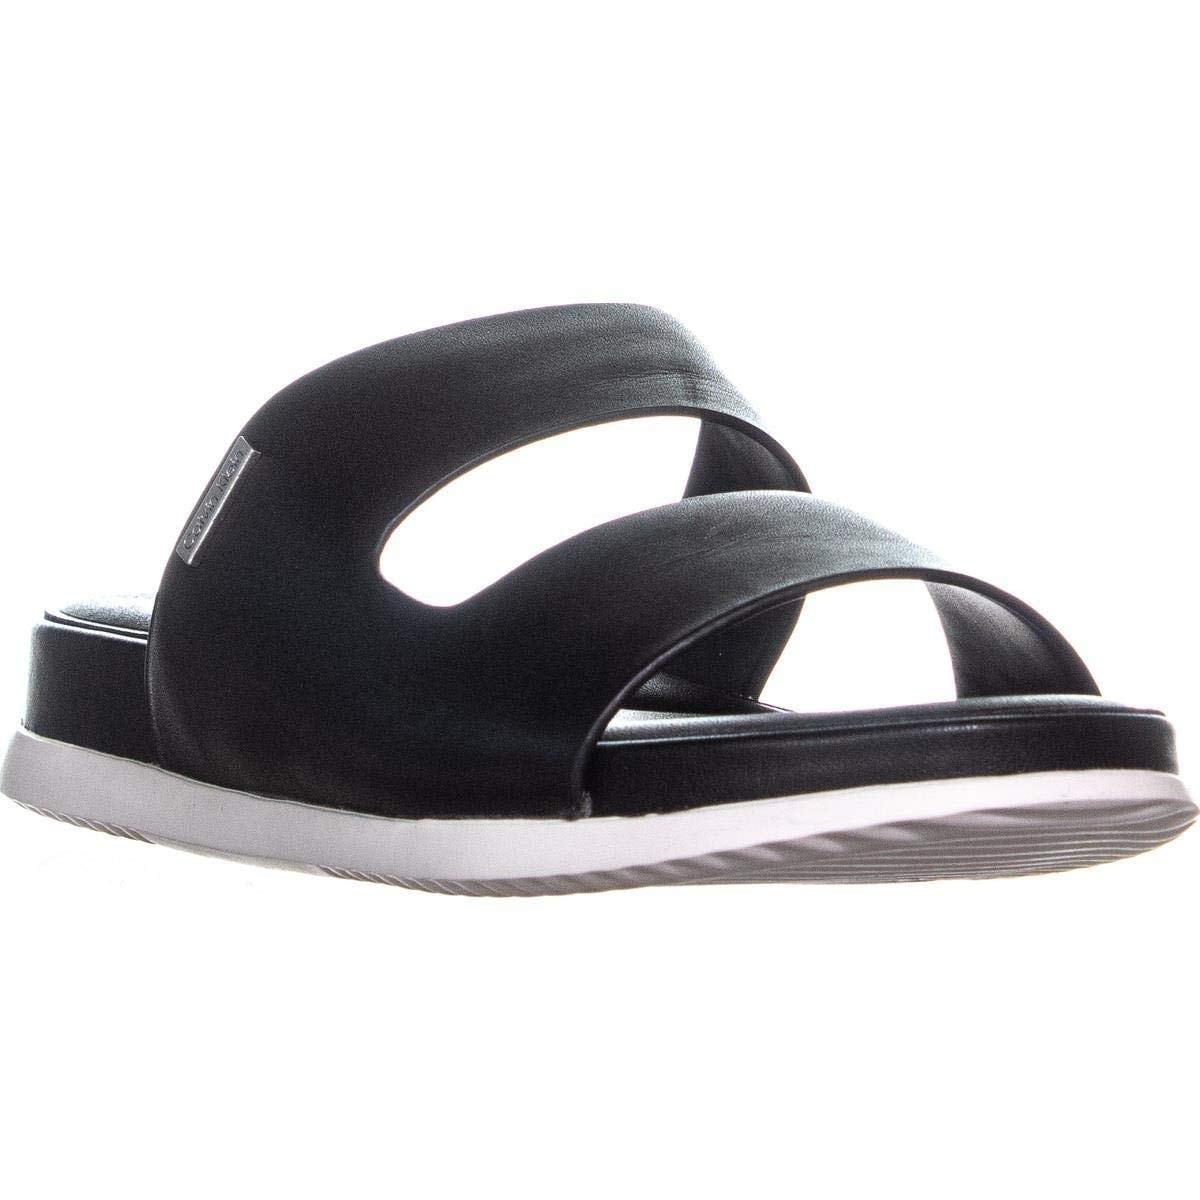 Womens Open Klein Sandals Casual Slide Calvin Diona Toe qULSzMVpG